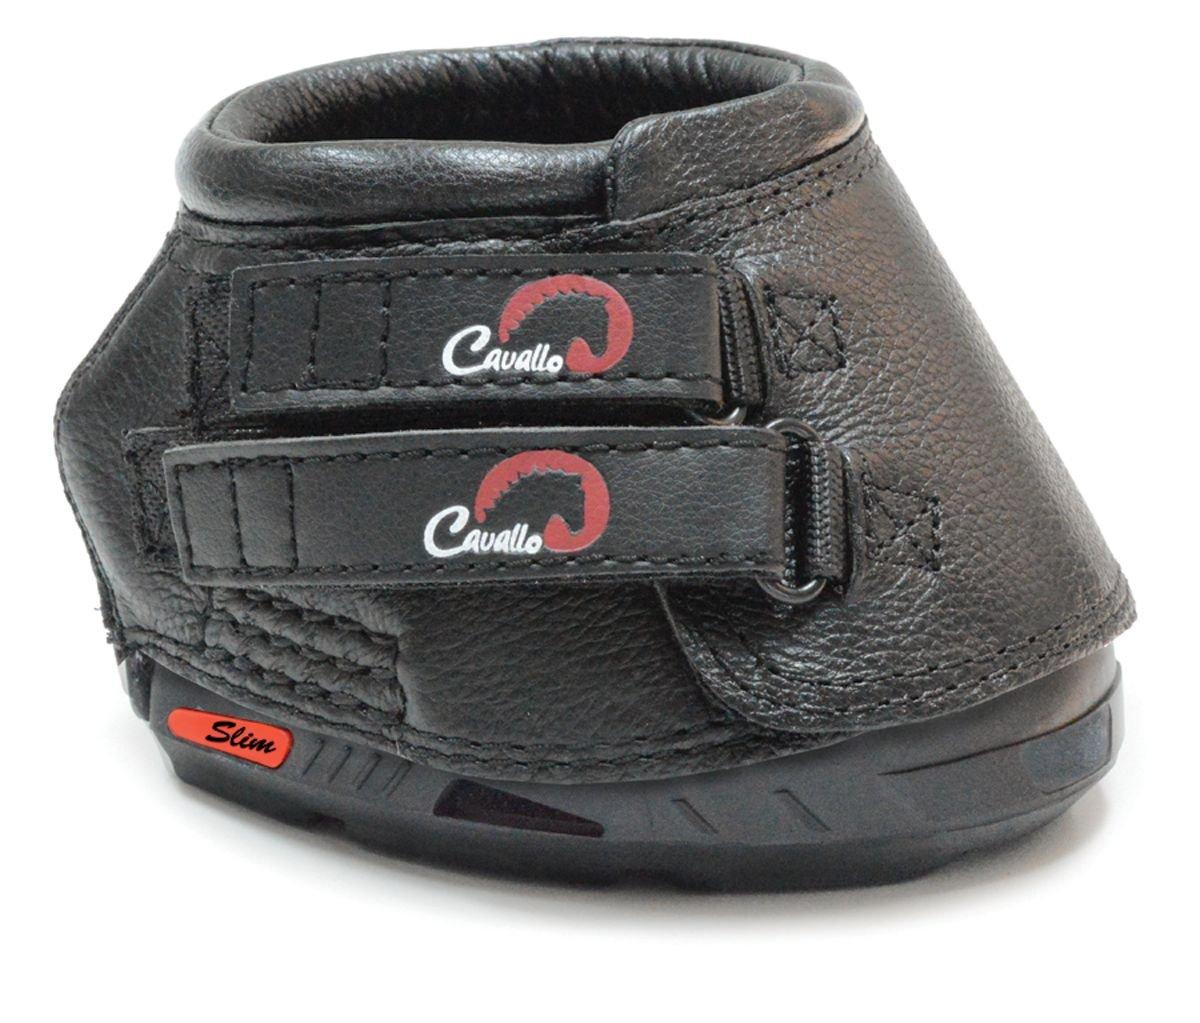 Cavallo Sport Regular Hoof Boots - Size:02 Color:Black